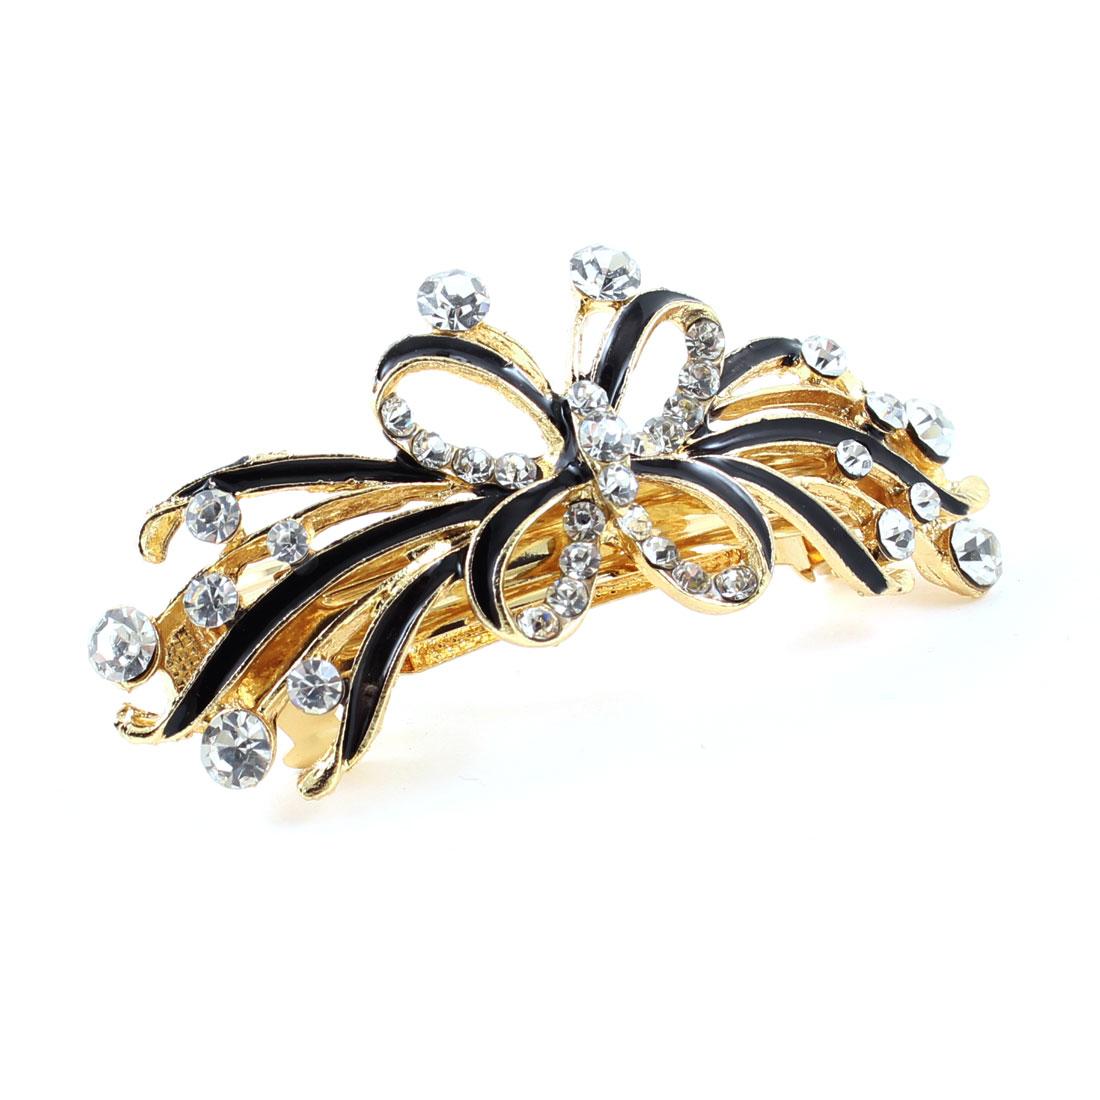 Black Butterfly Designed Rhinestone Inlaid Barrette French Hair Clip